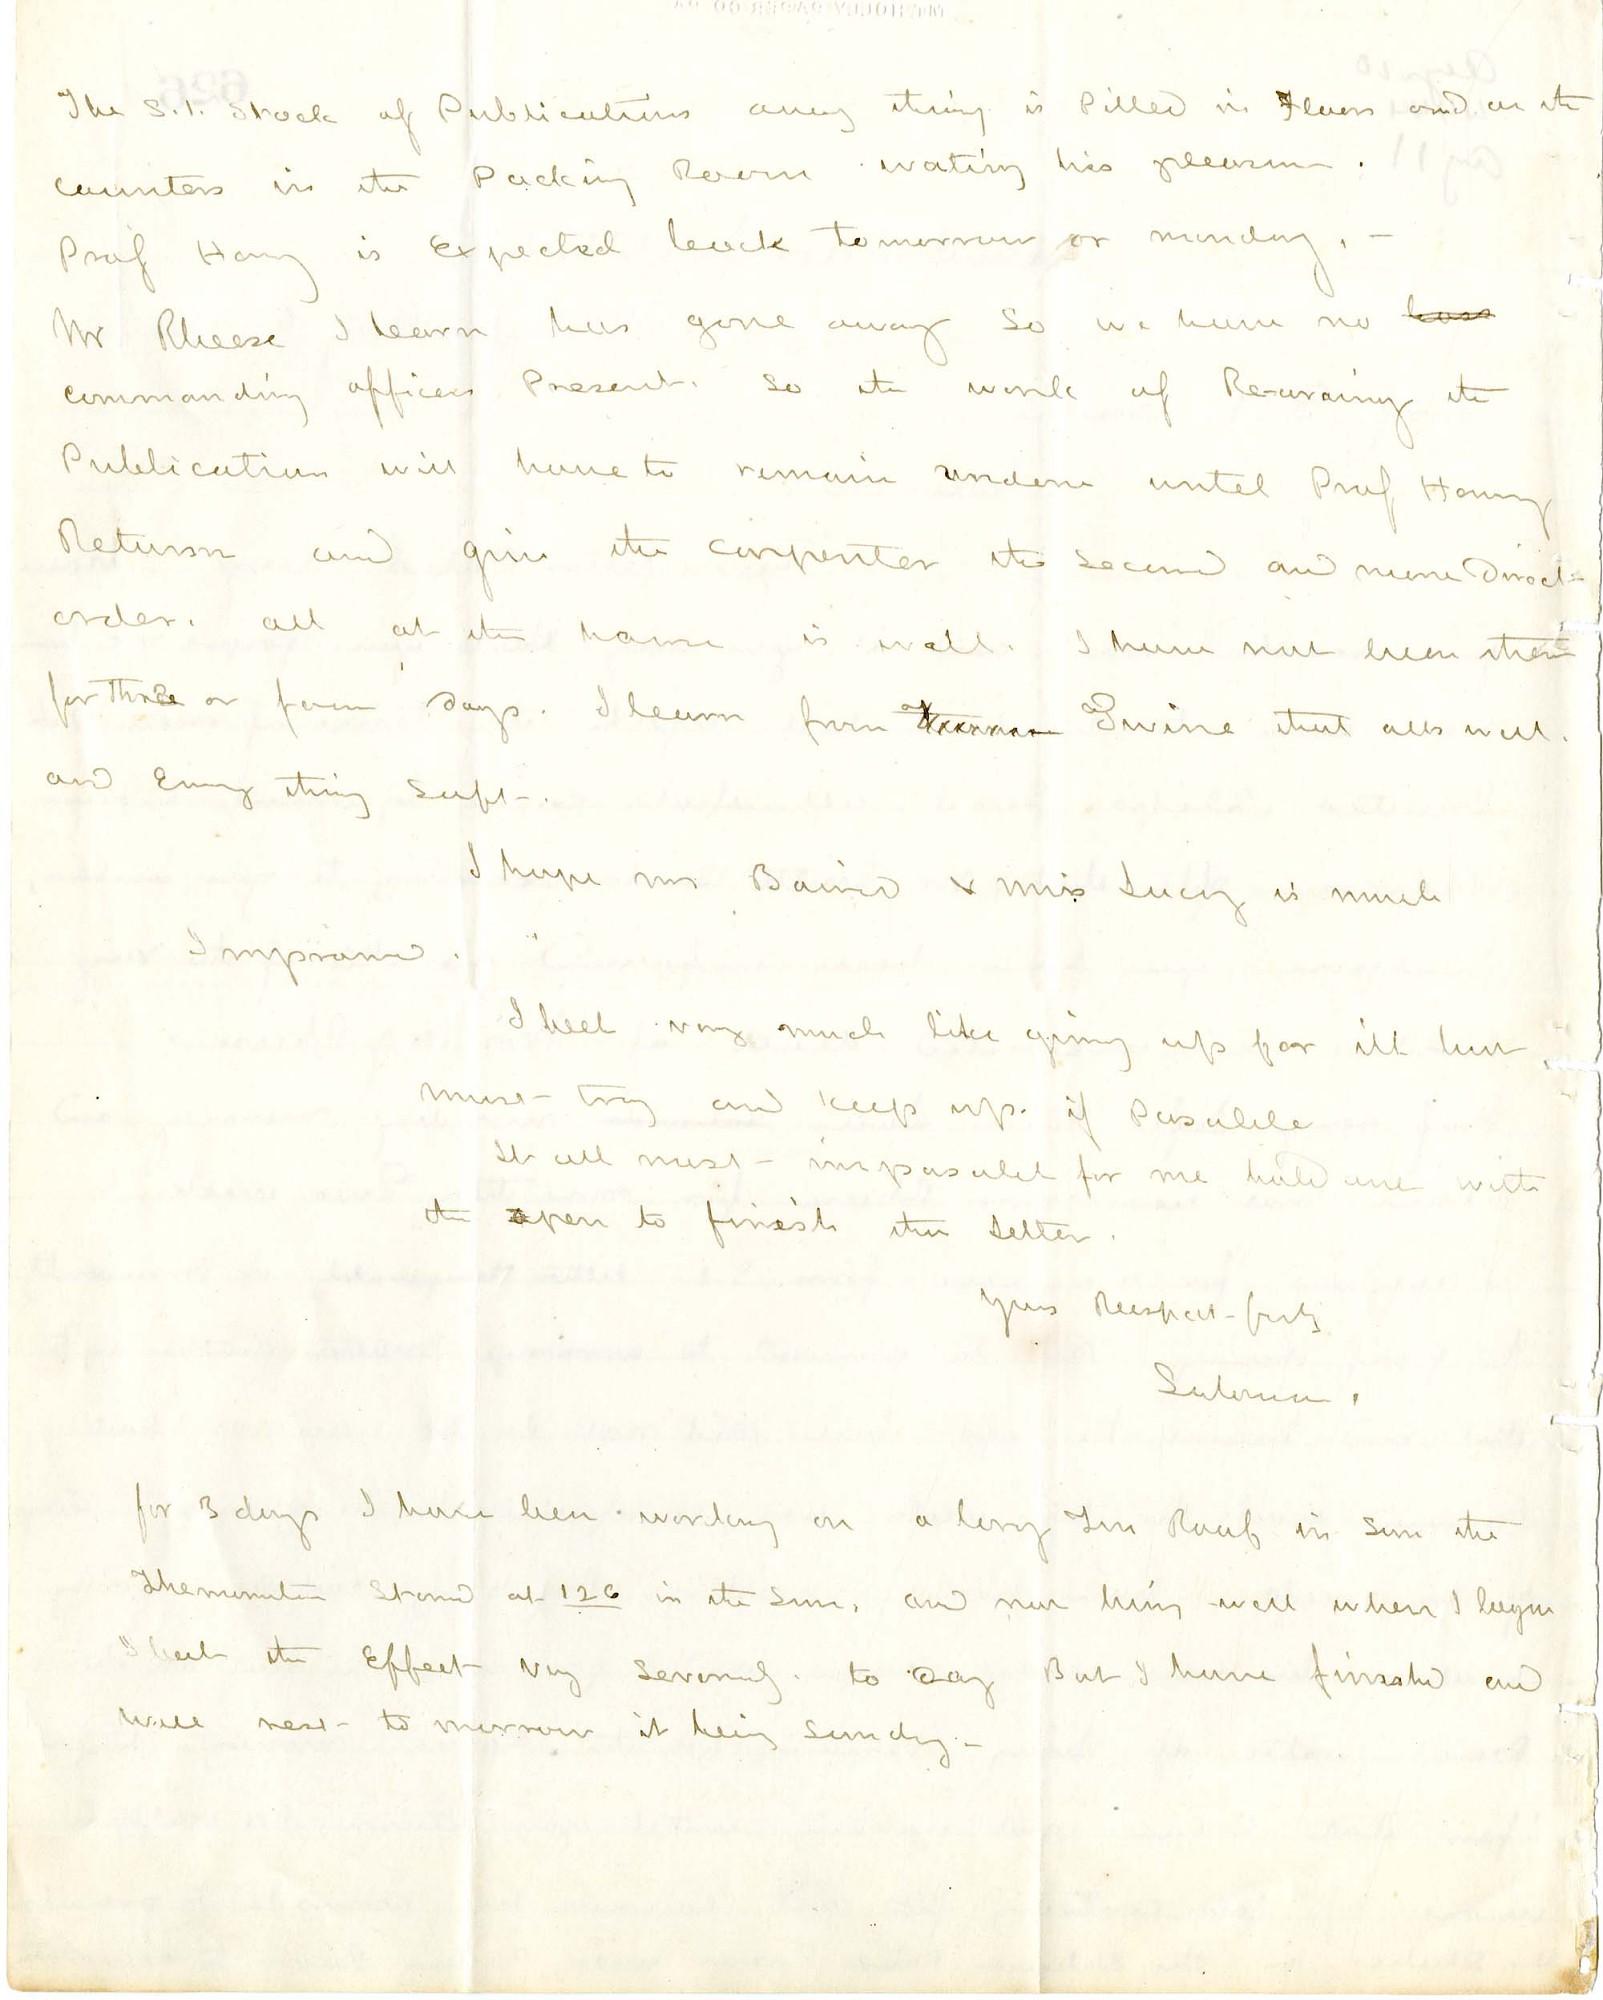 Solomon Brown Letter - Aug 6, 1864 - Page 2